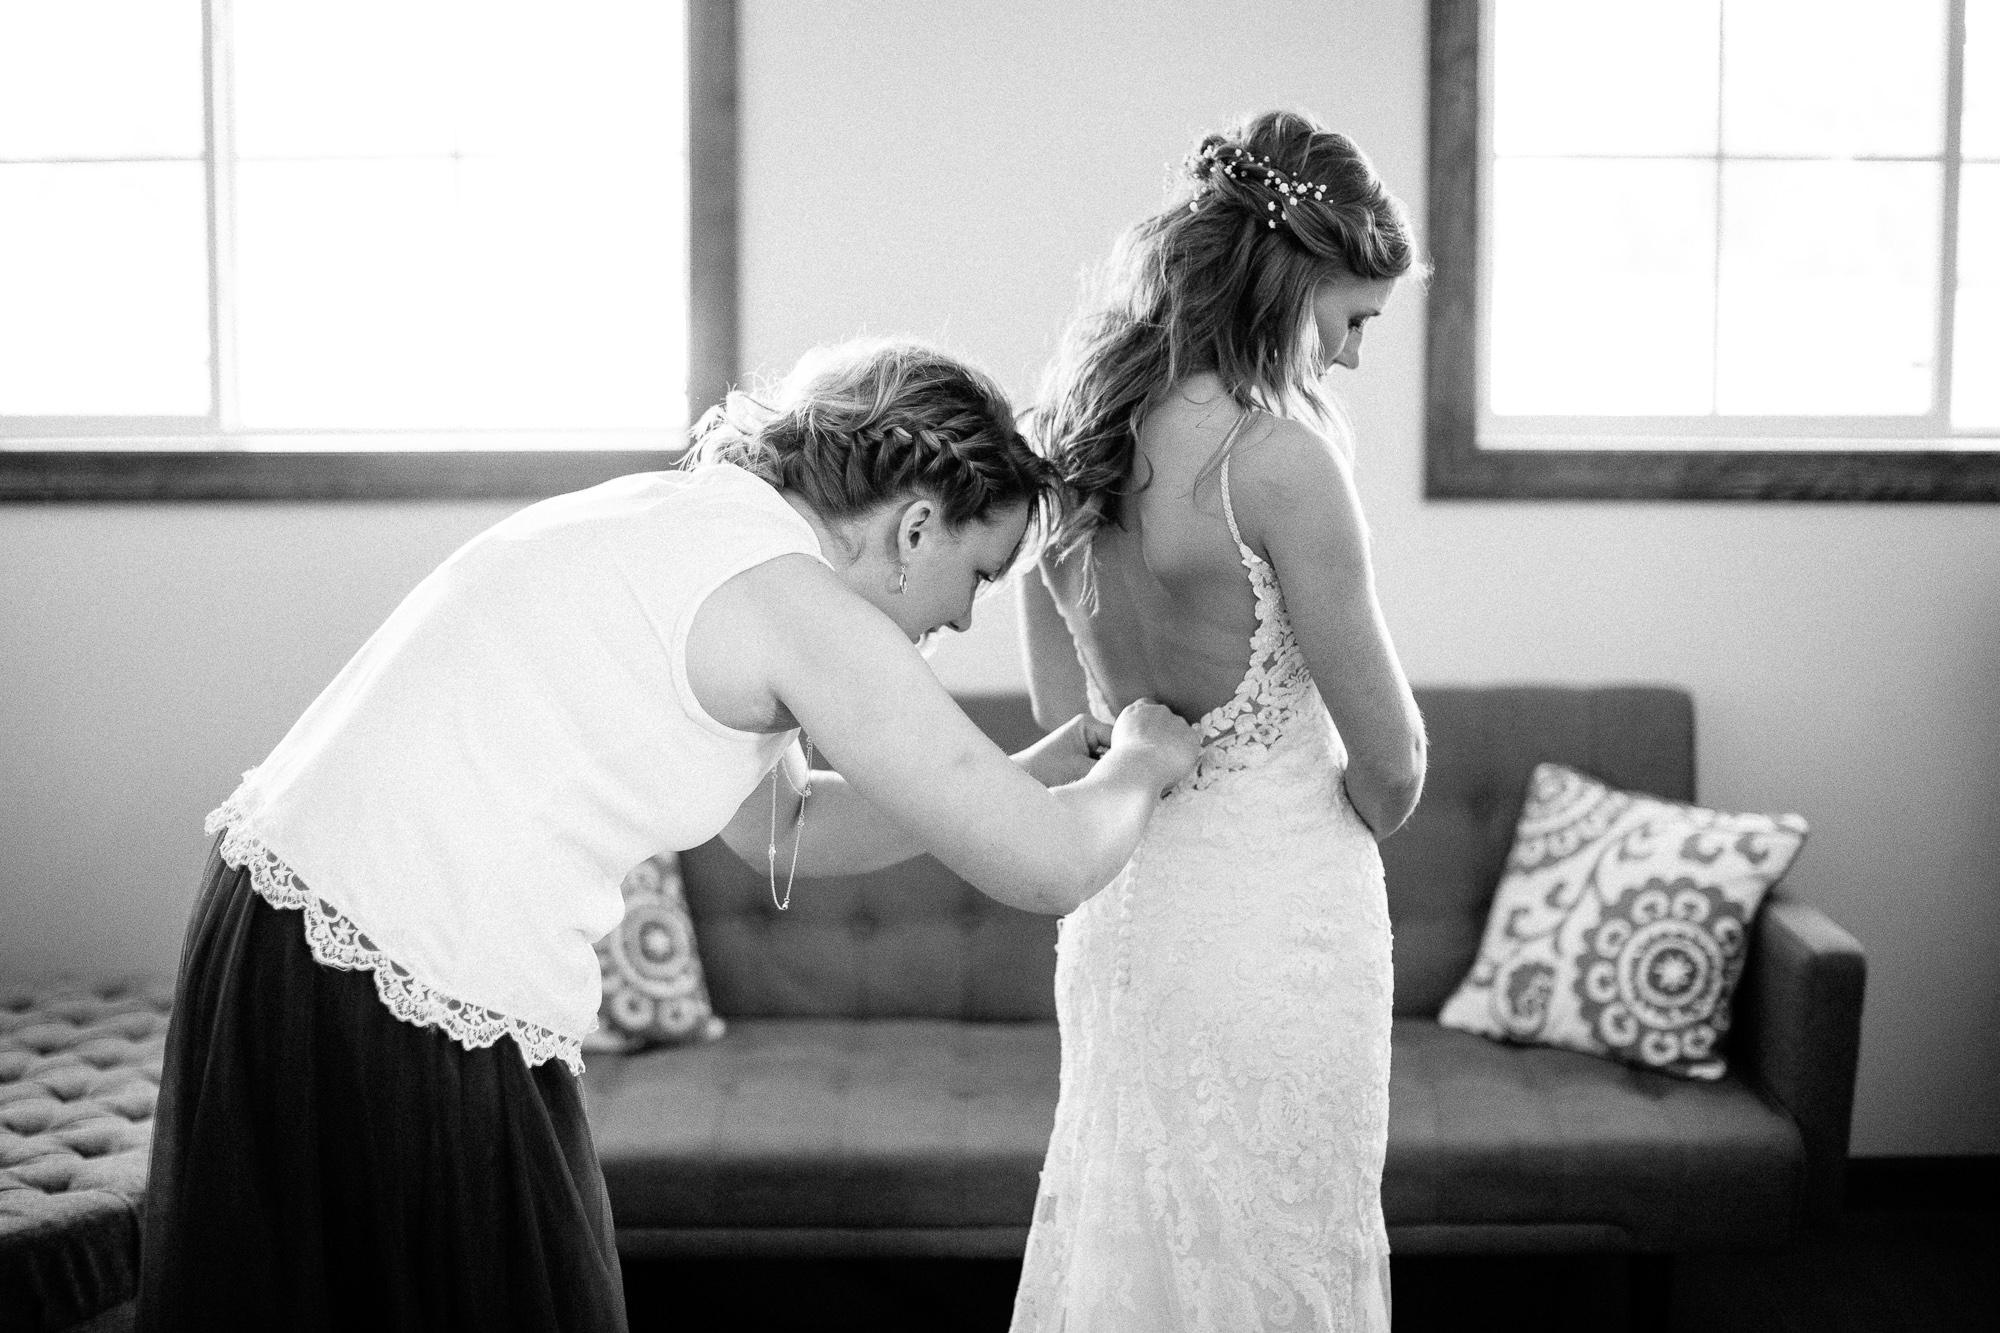 wedding-elopement-adventerous-romantic-timeless-south-dakota-blue-haven-barn-011.jpg